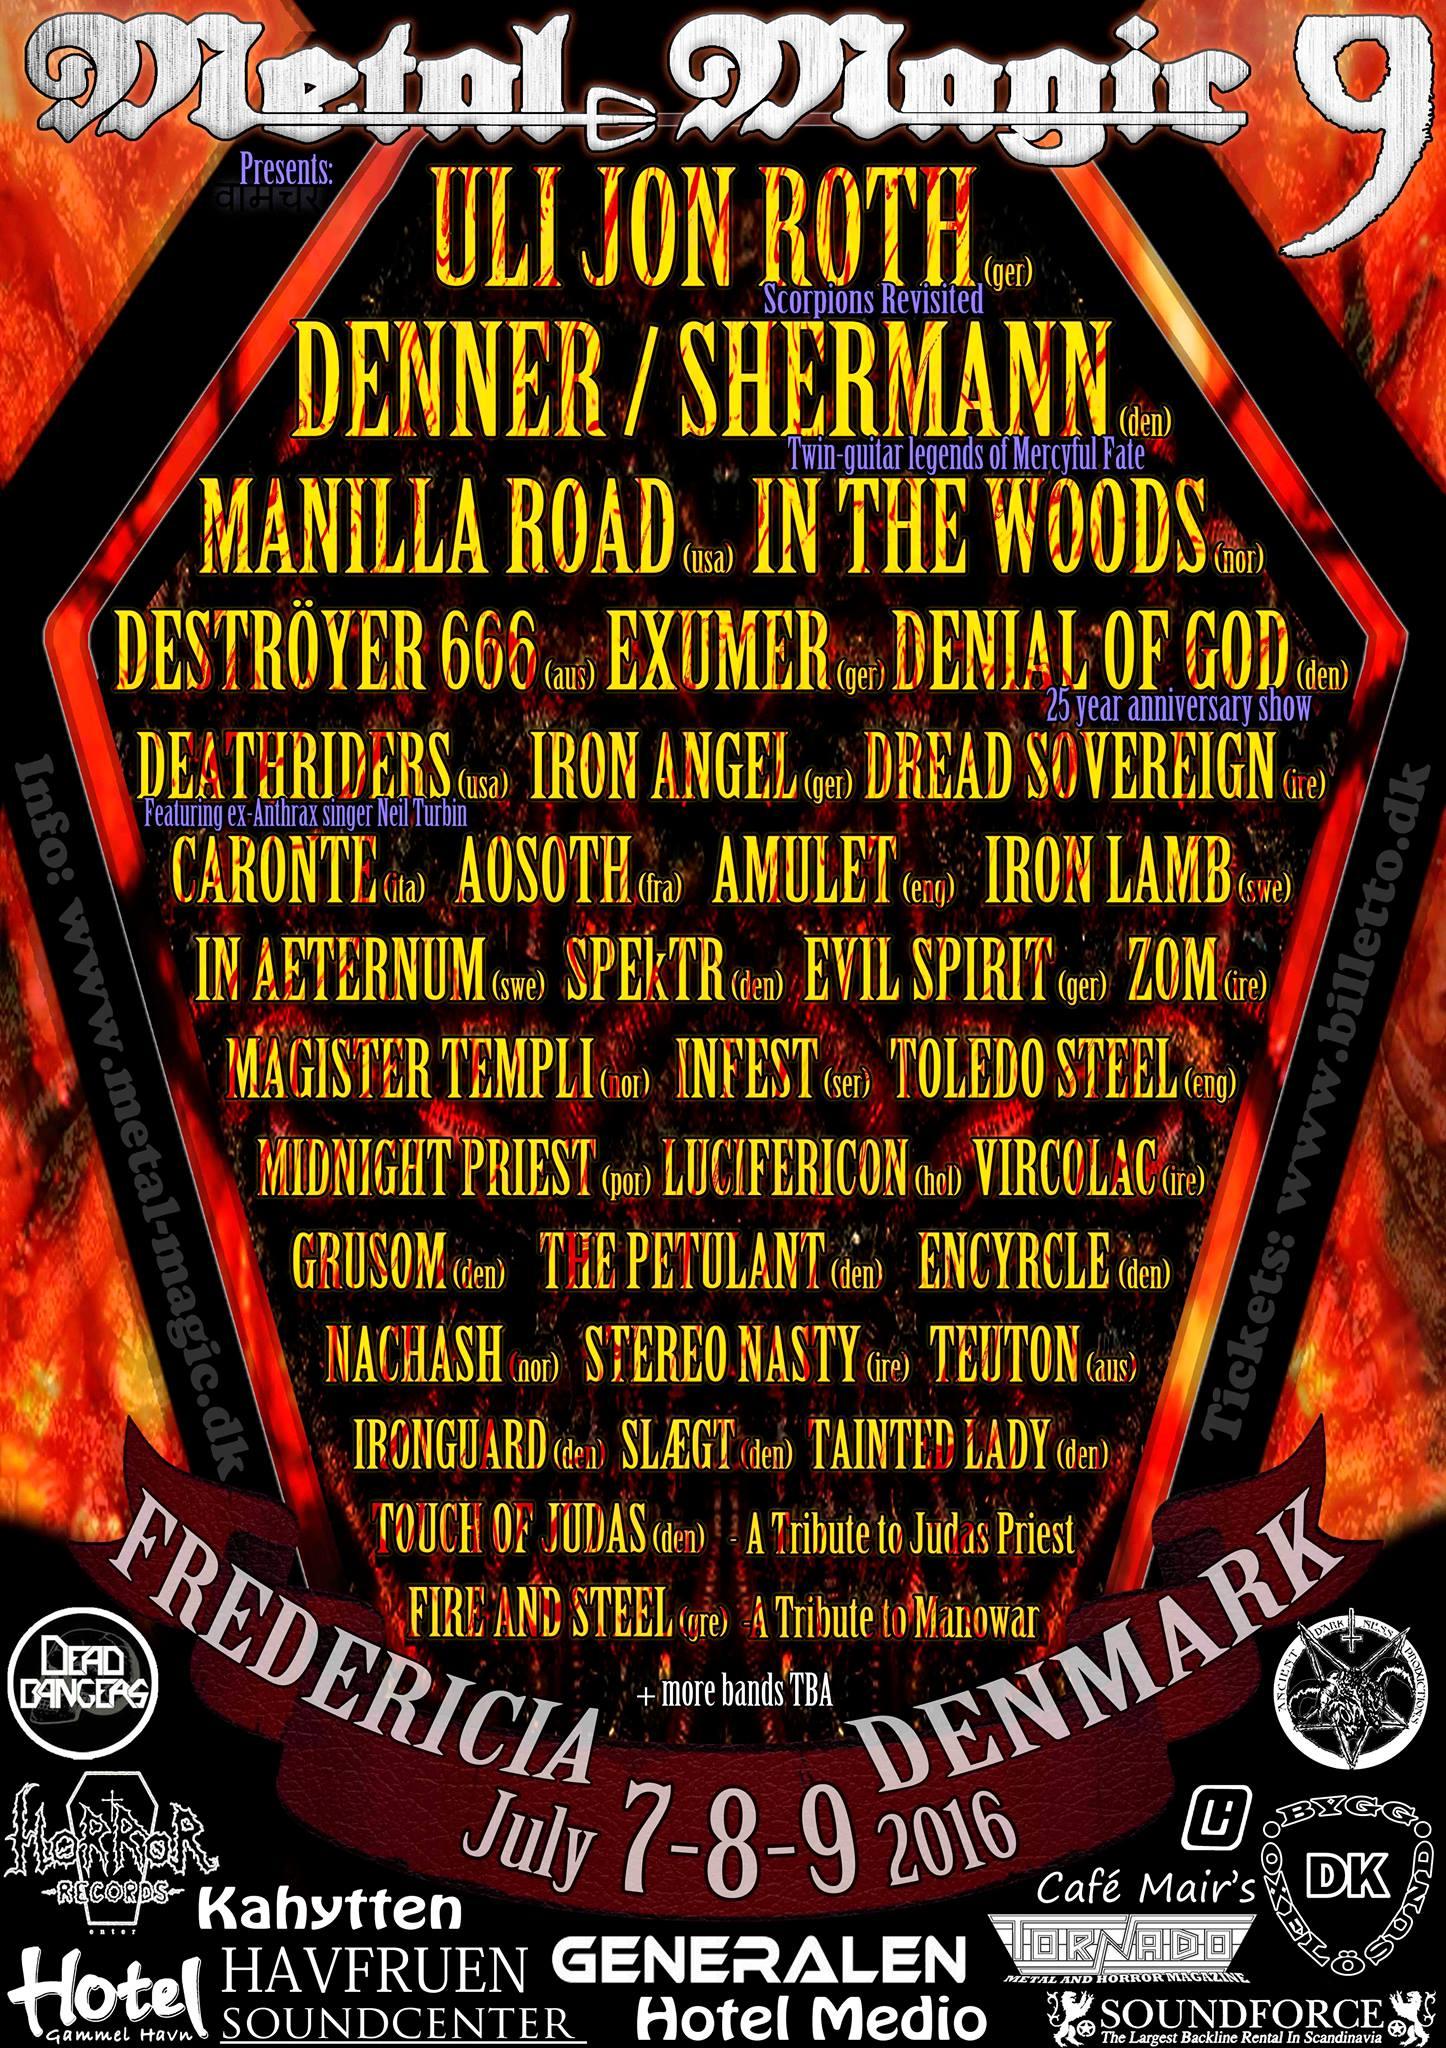 DeathRiders Metal Magic Festival Fredericia, Denmark 7/8/2016